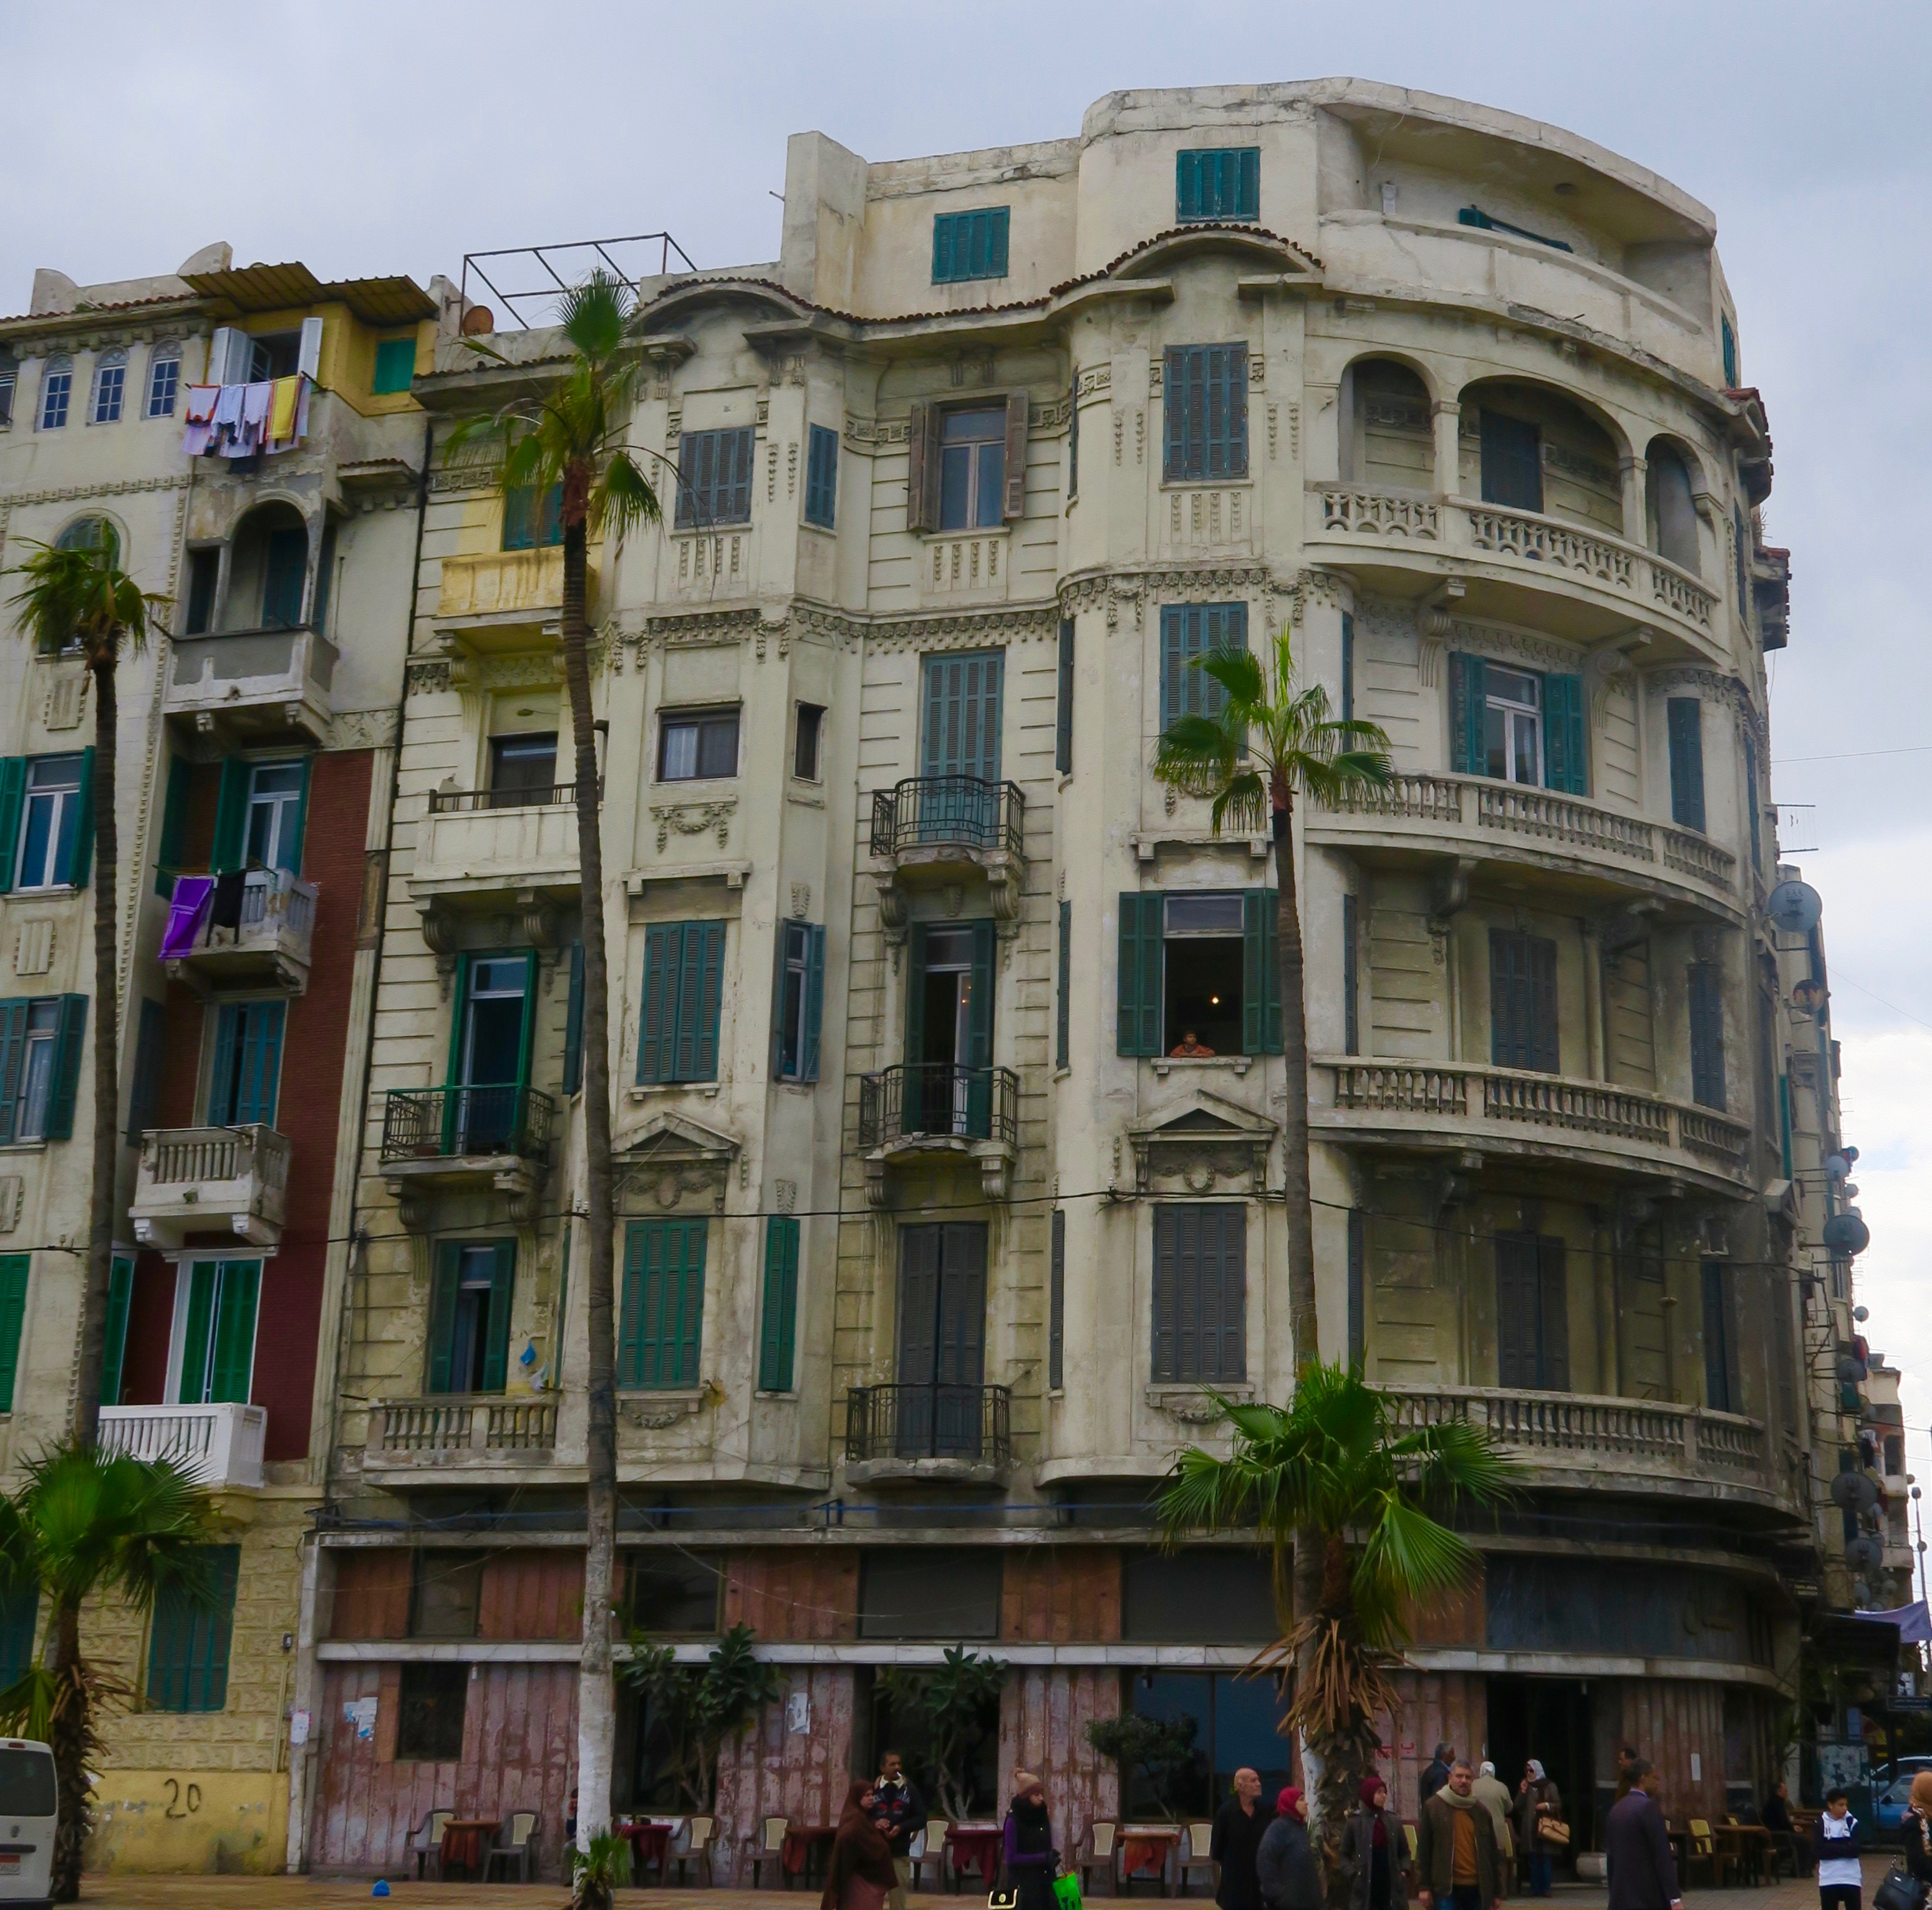 Crumbling Buildings on the Alexandria Corniche